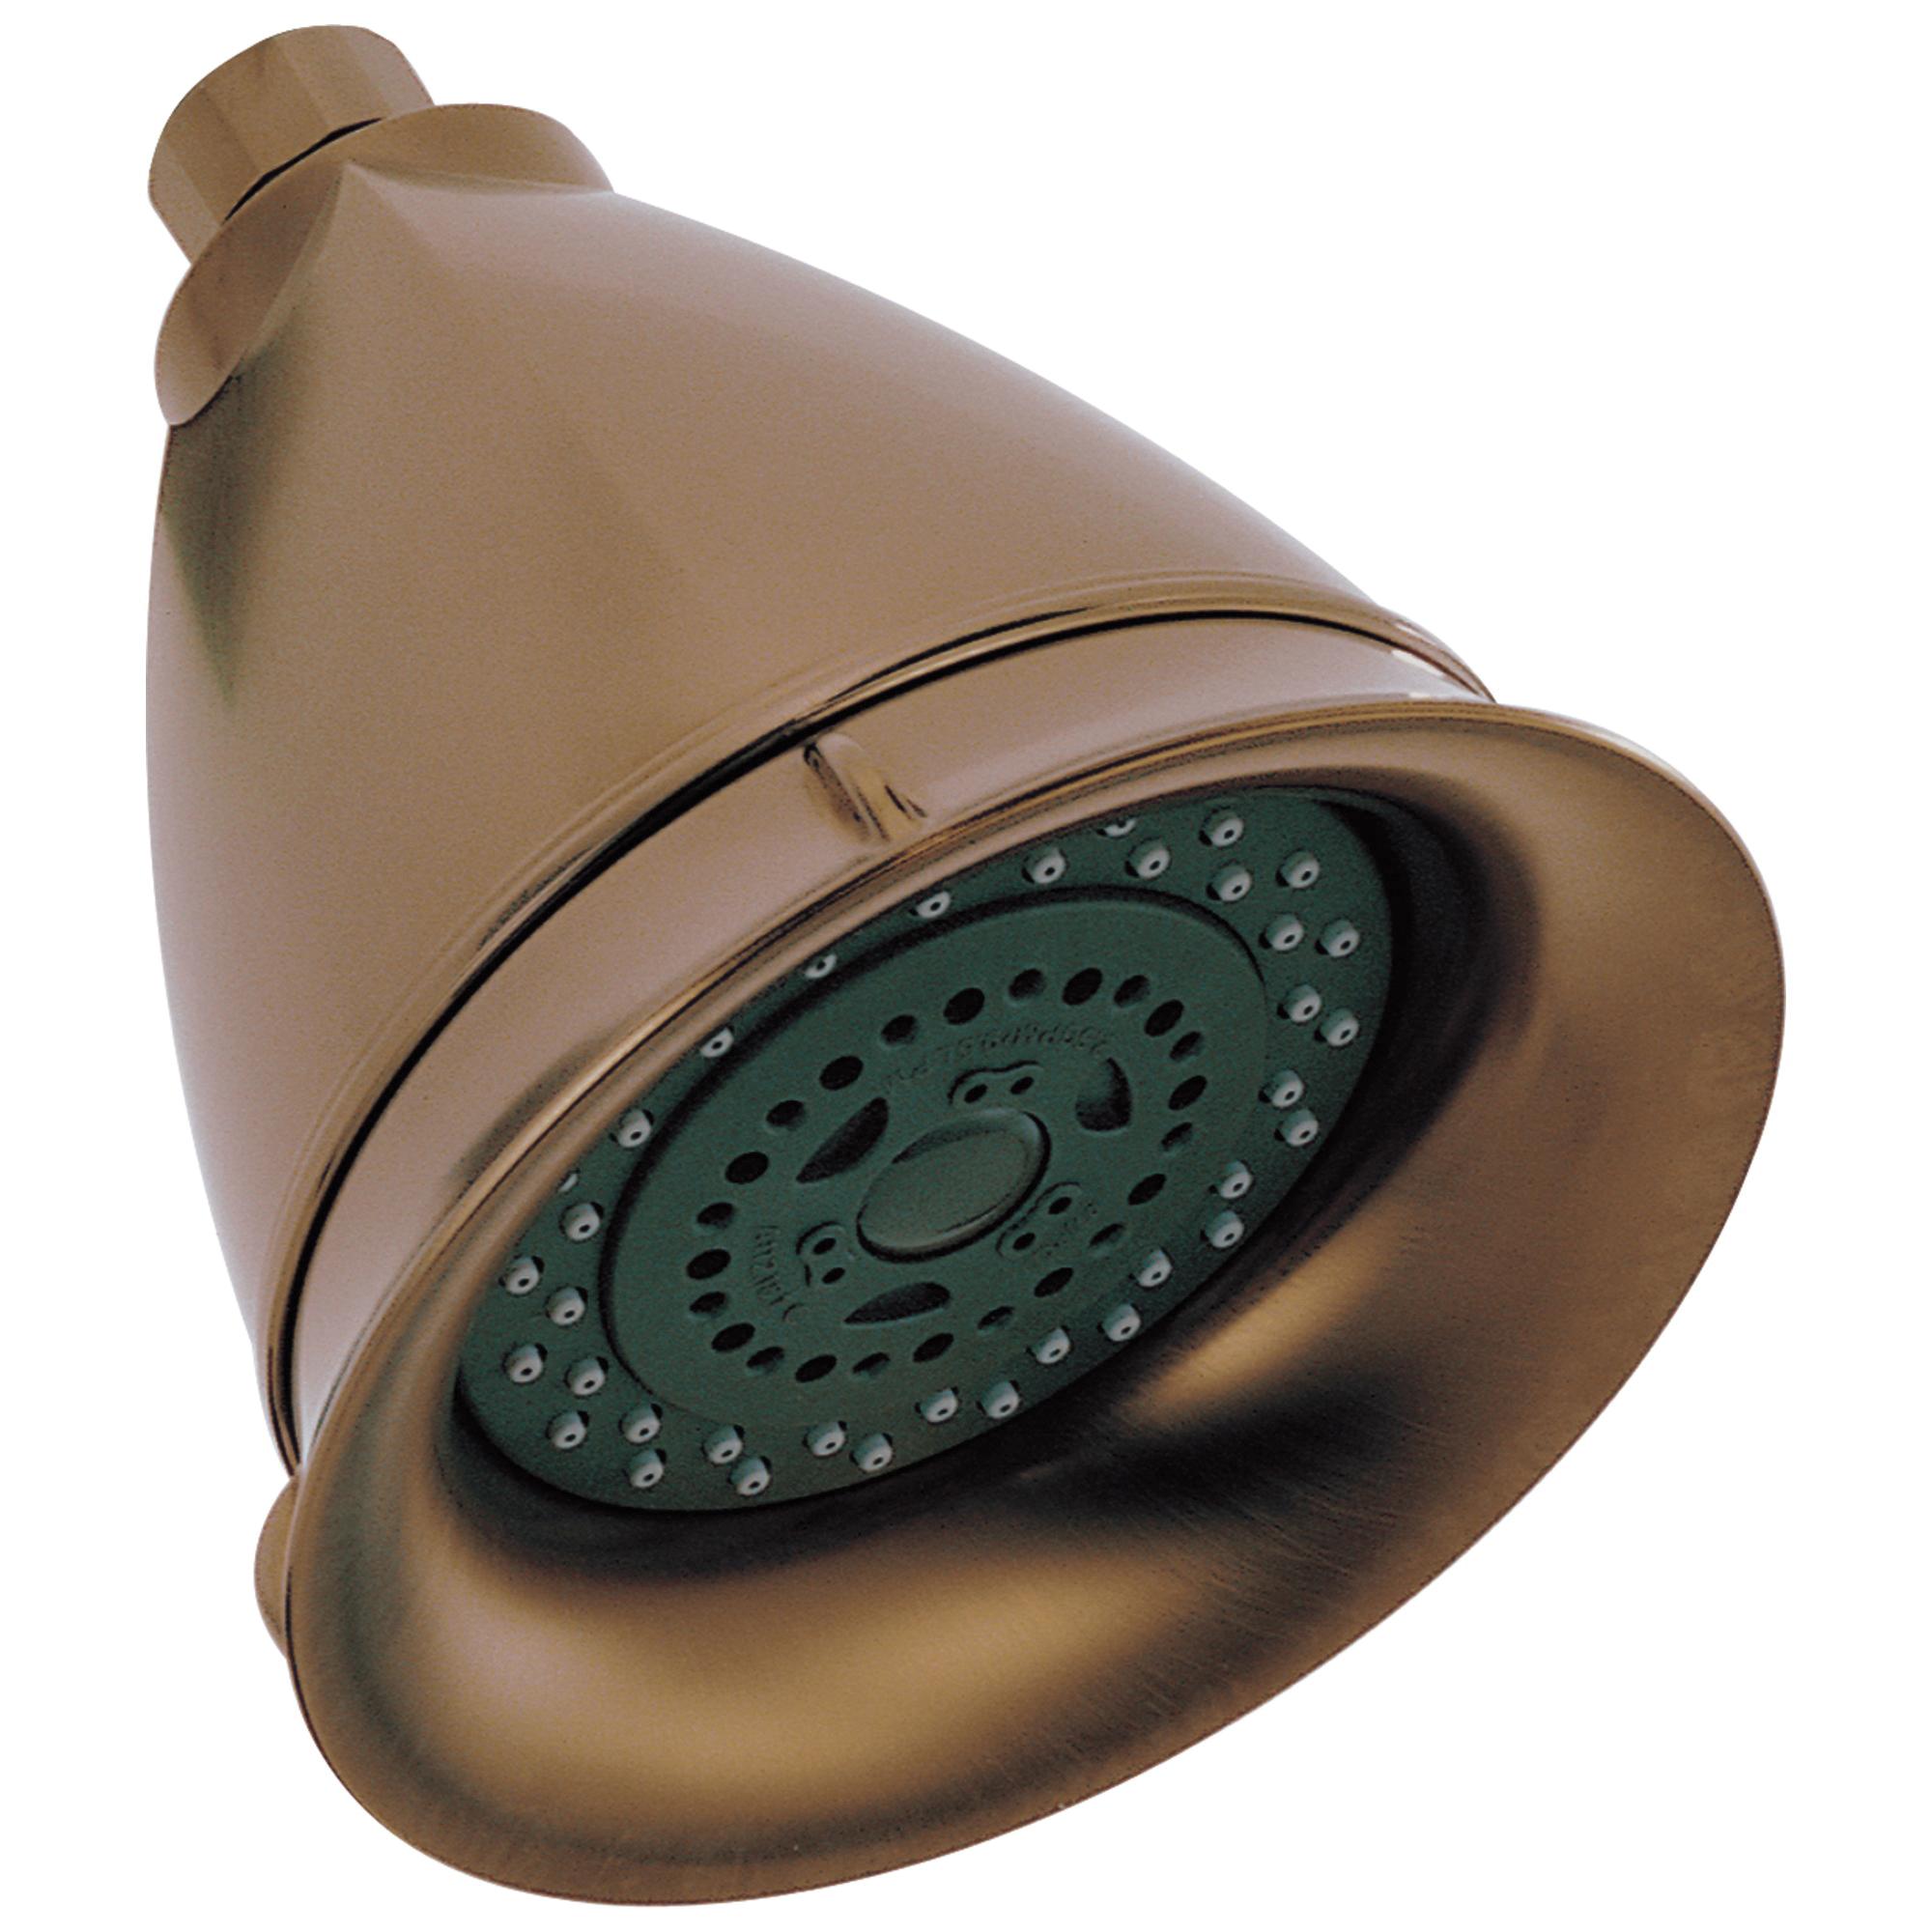 Brizo® RP42431BZ Raincan Shower Head, Vesi®, 2.5 gpm Minimum, 3 Sprays, Wall Mount, Import